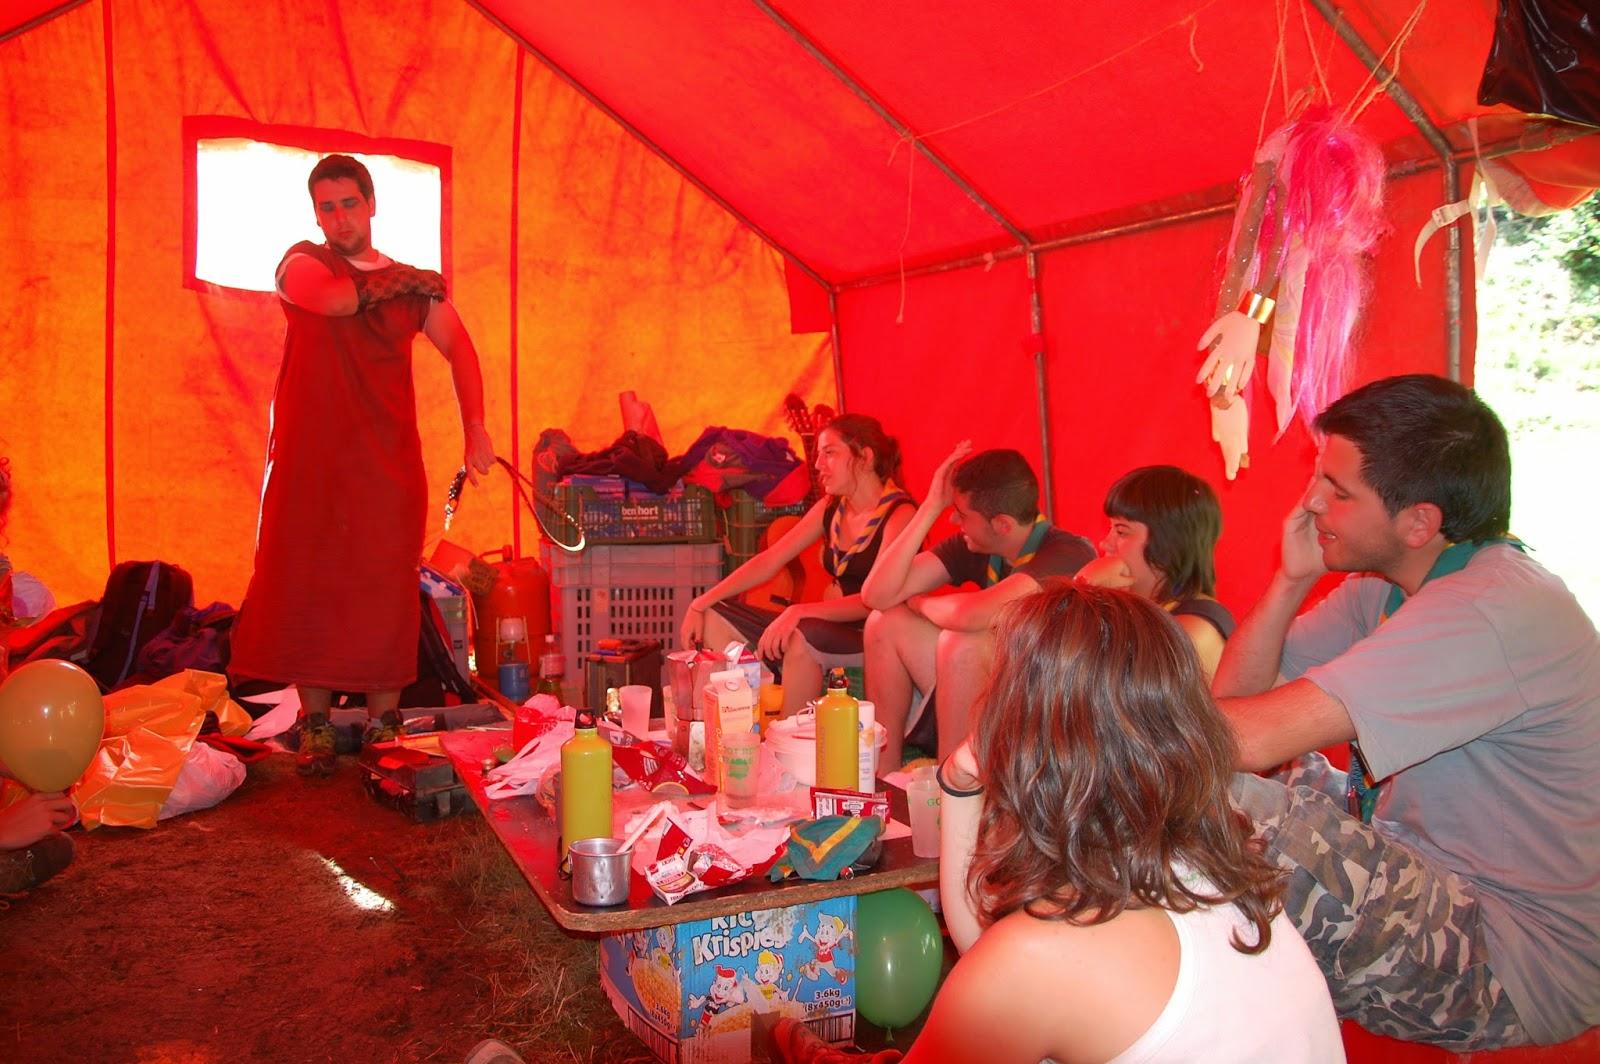 Campaments Estiu RolandKing 2011 - DSC_0102.JPG